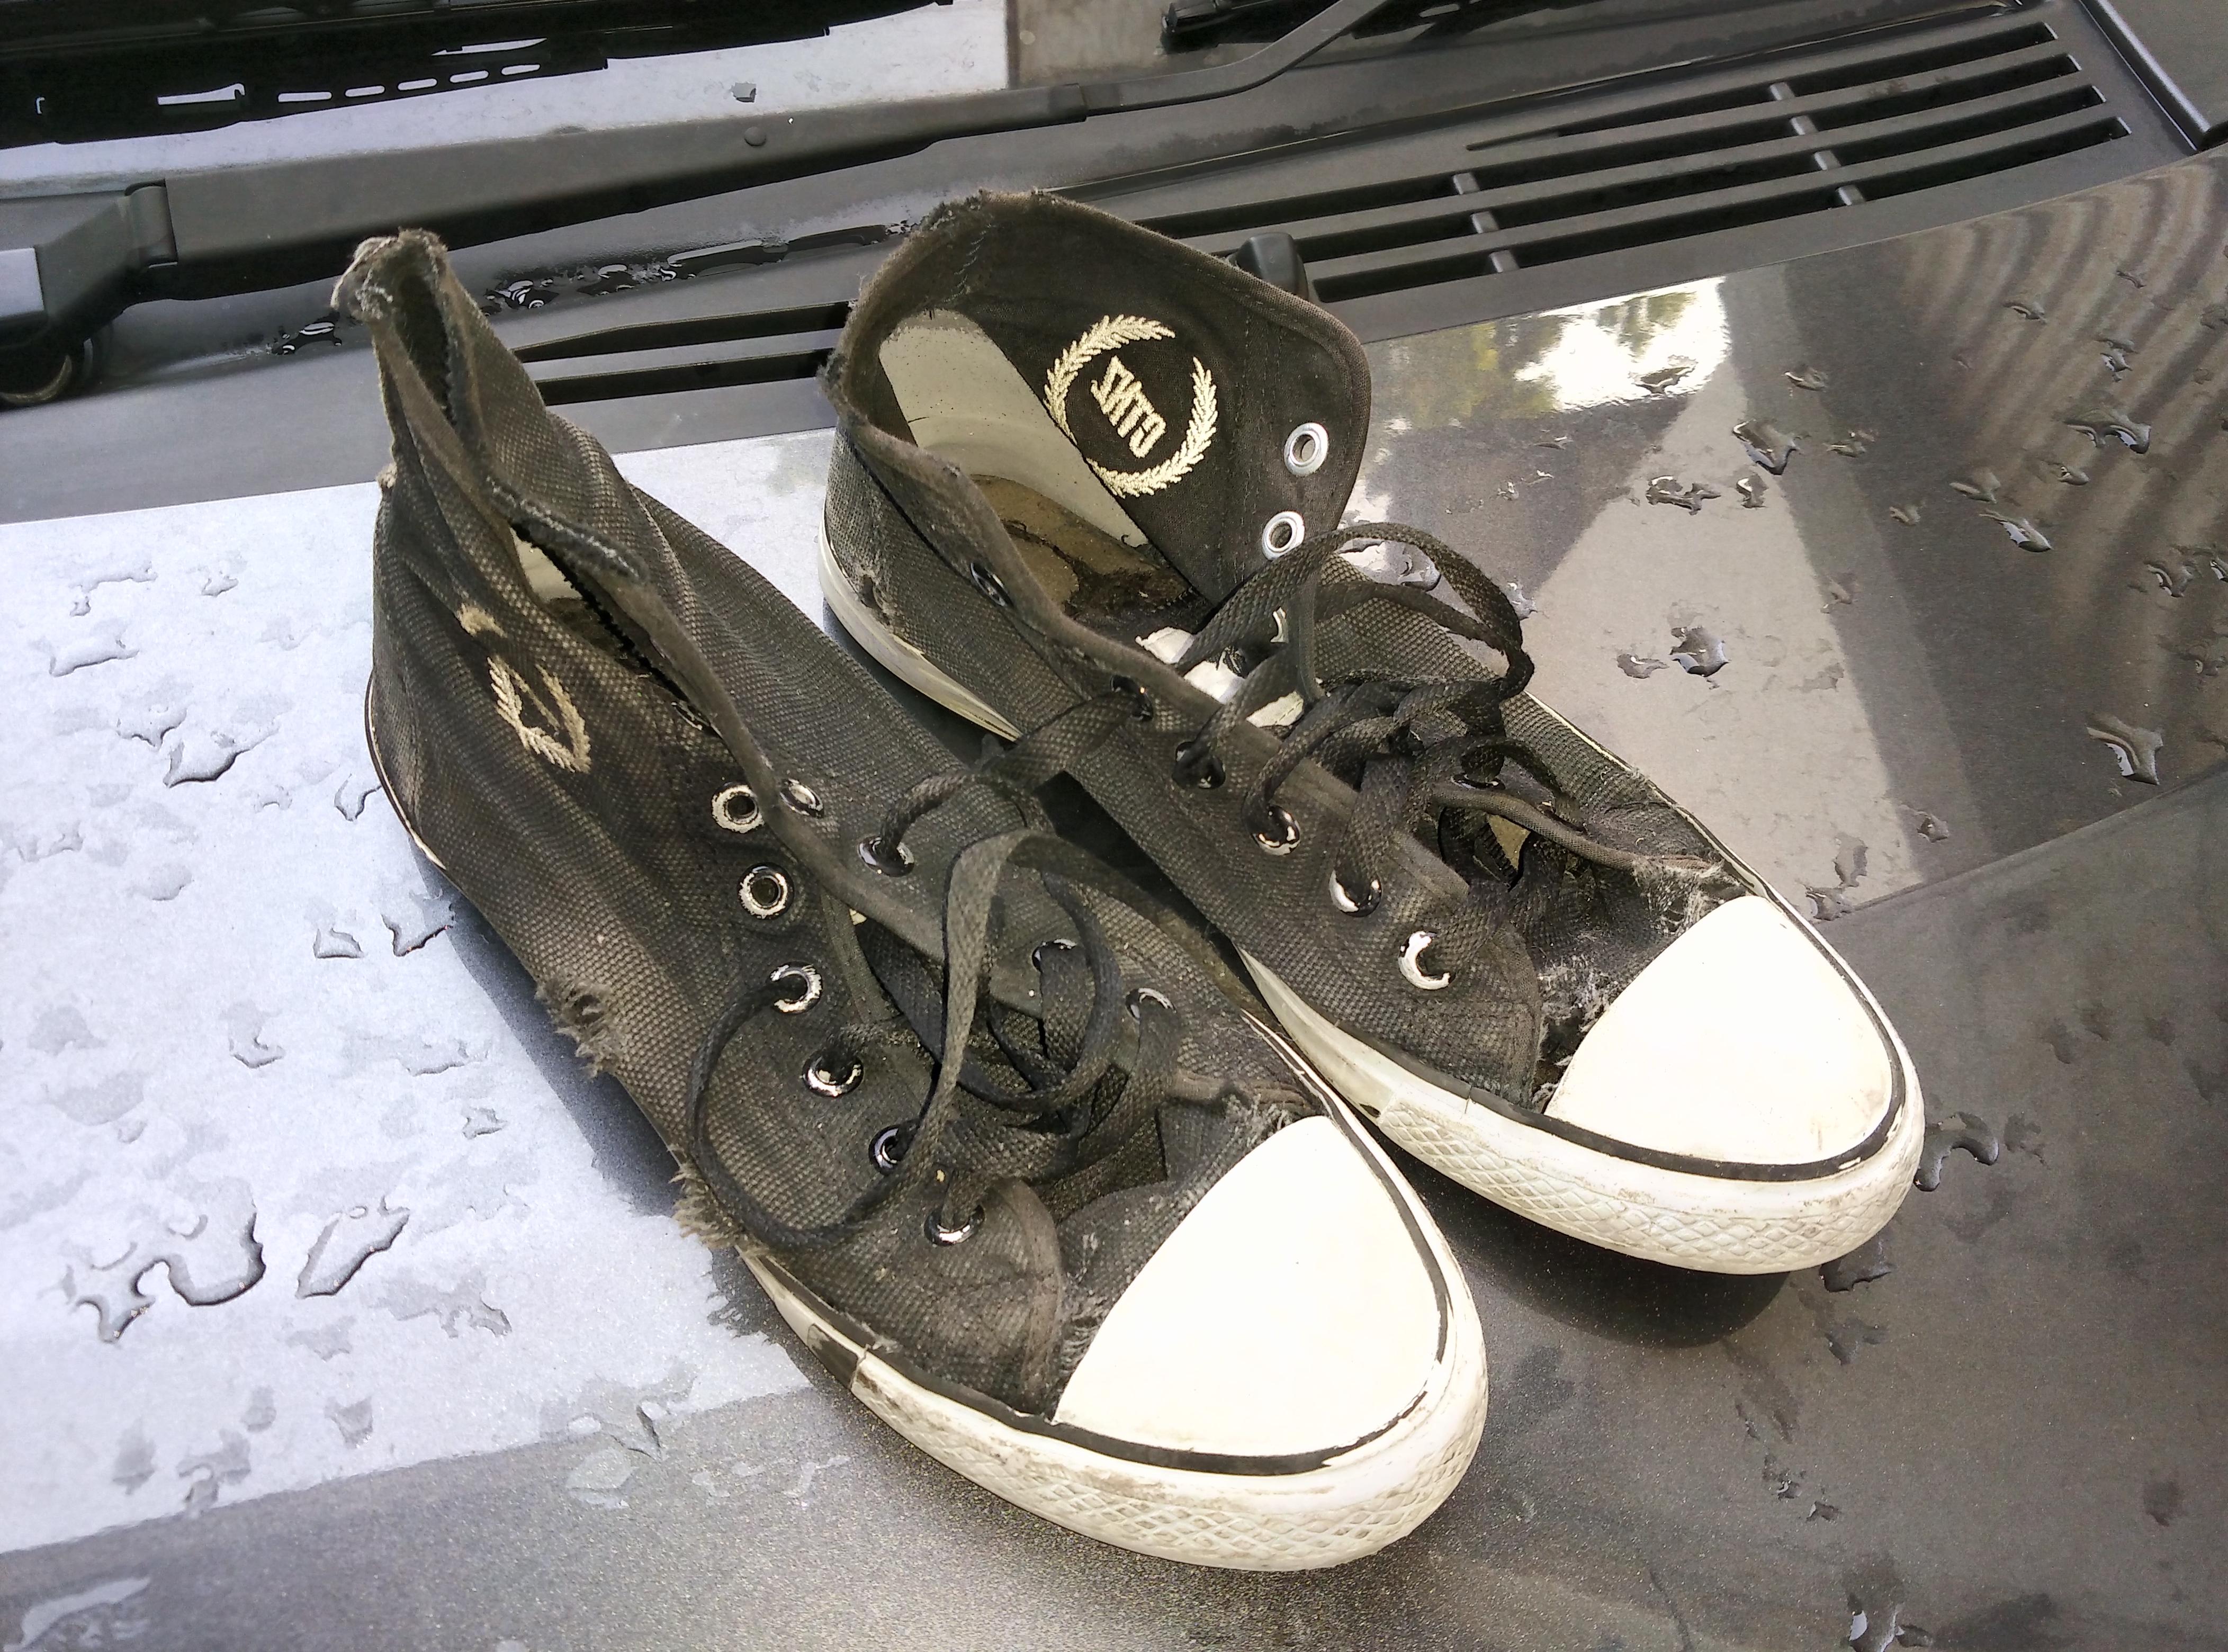 Akhirnya saya ambilkan tali sepatu putih dari sepatu keds saya yang mahal dan masih baru original branded items khan nggak dipakai tendang tendang kayak